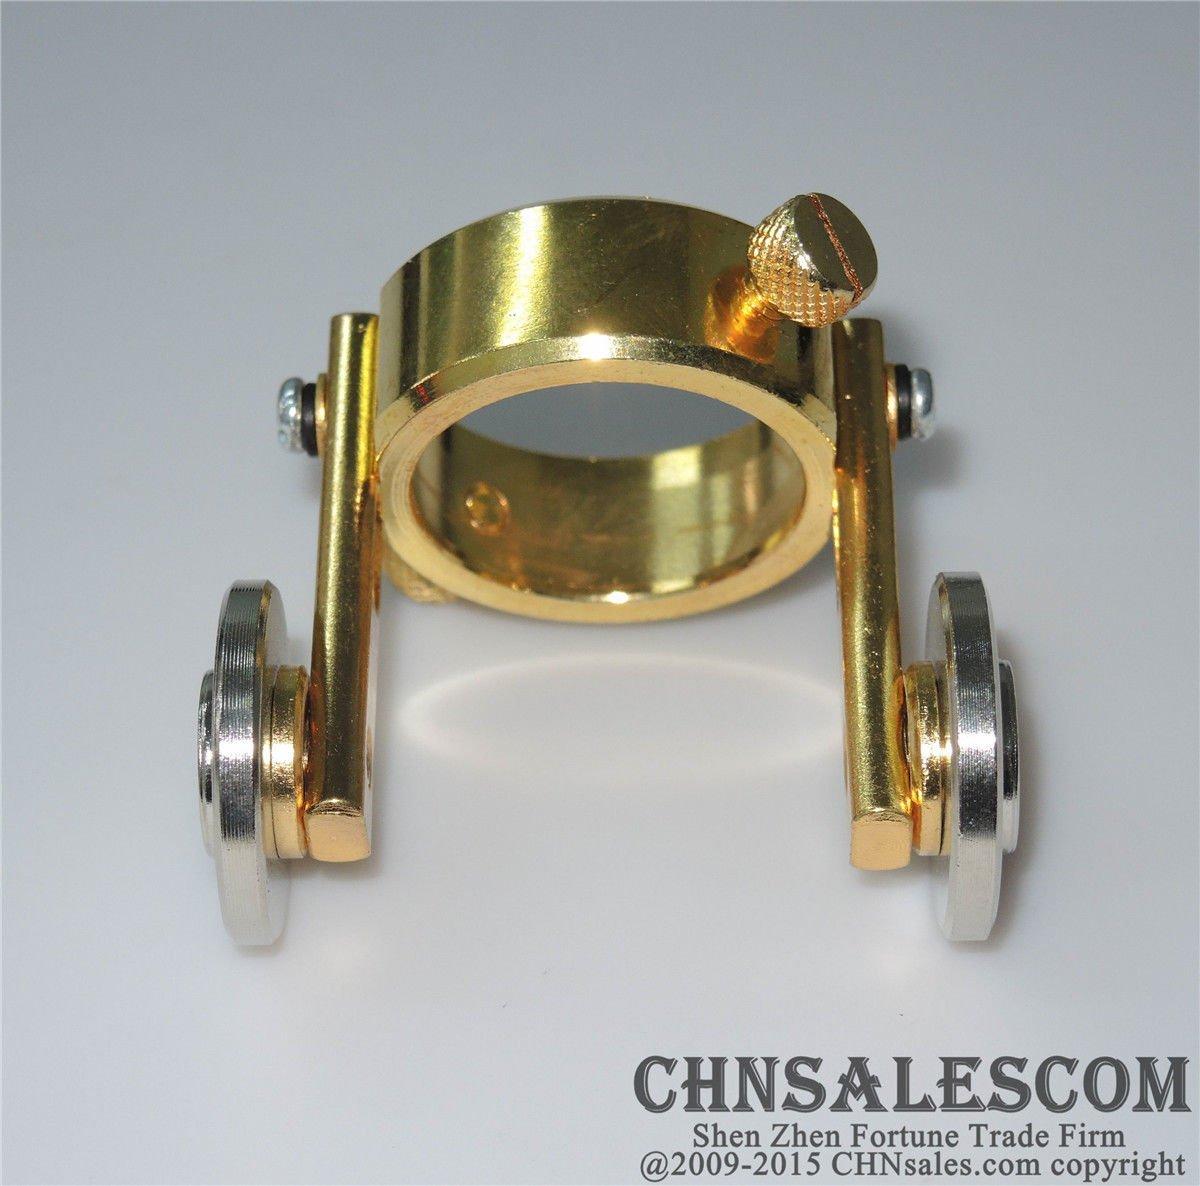 CHNsalescom P-80 Plasma Cutter Torch Roller Guide Wheel Strengthen the Durability of Luxury